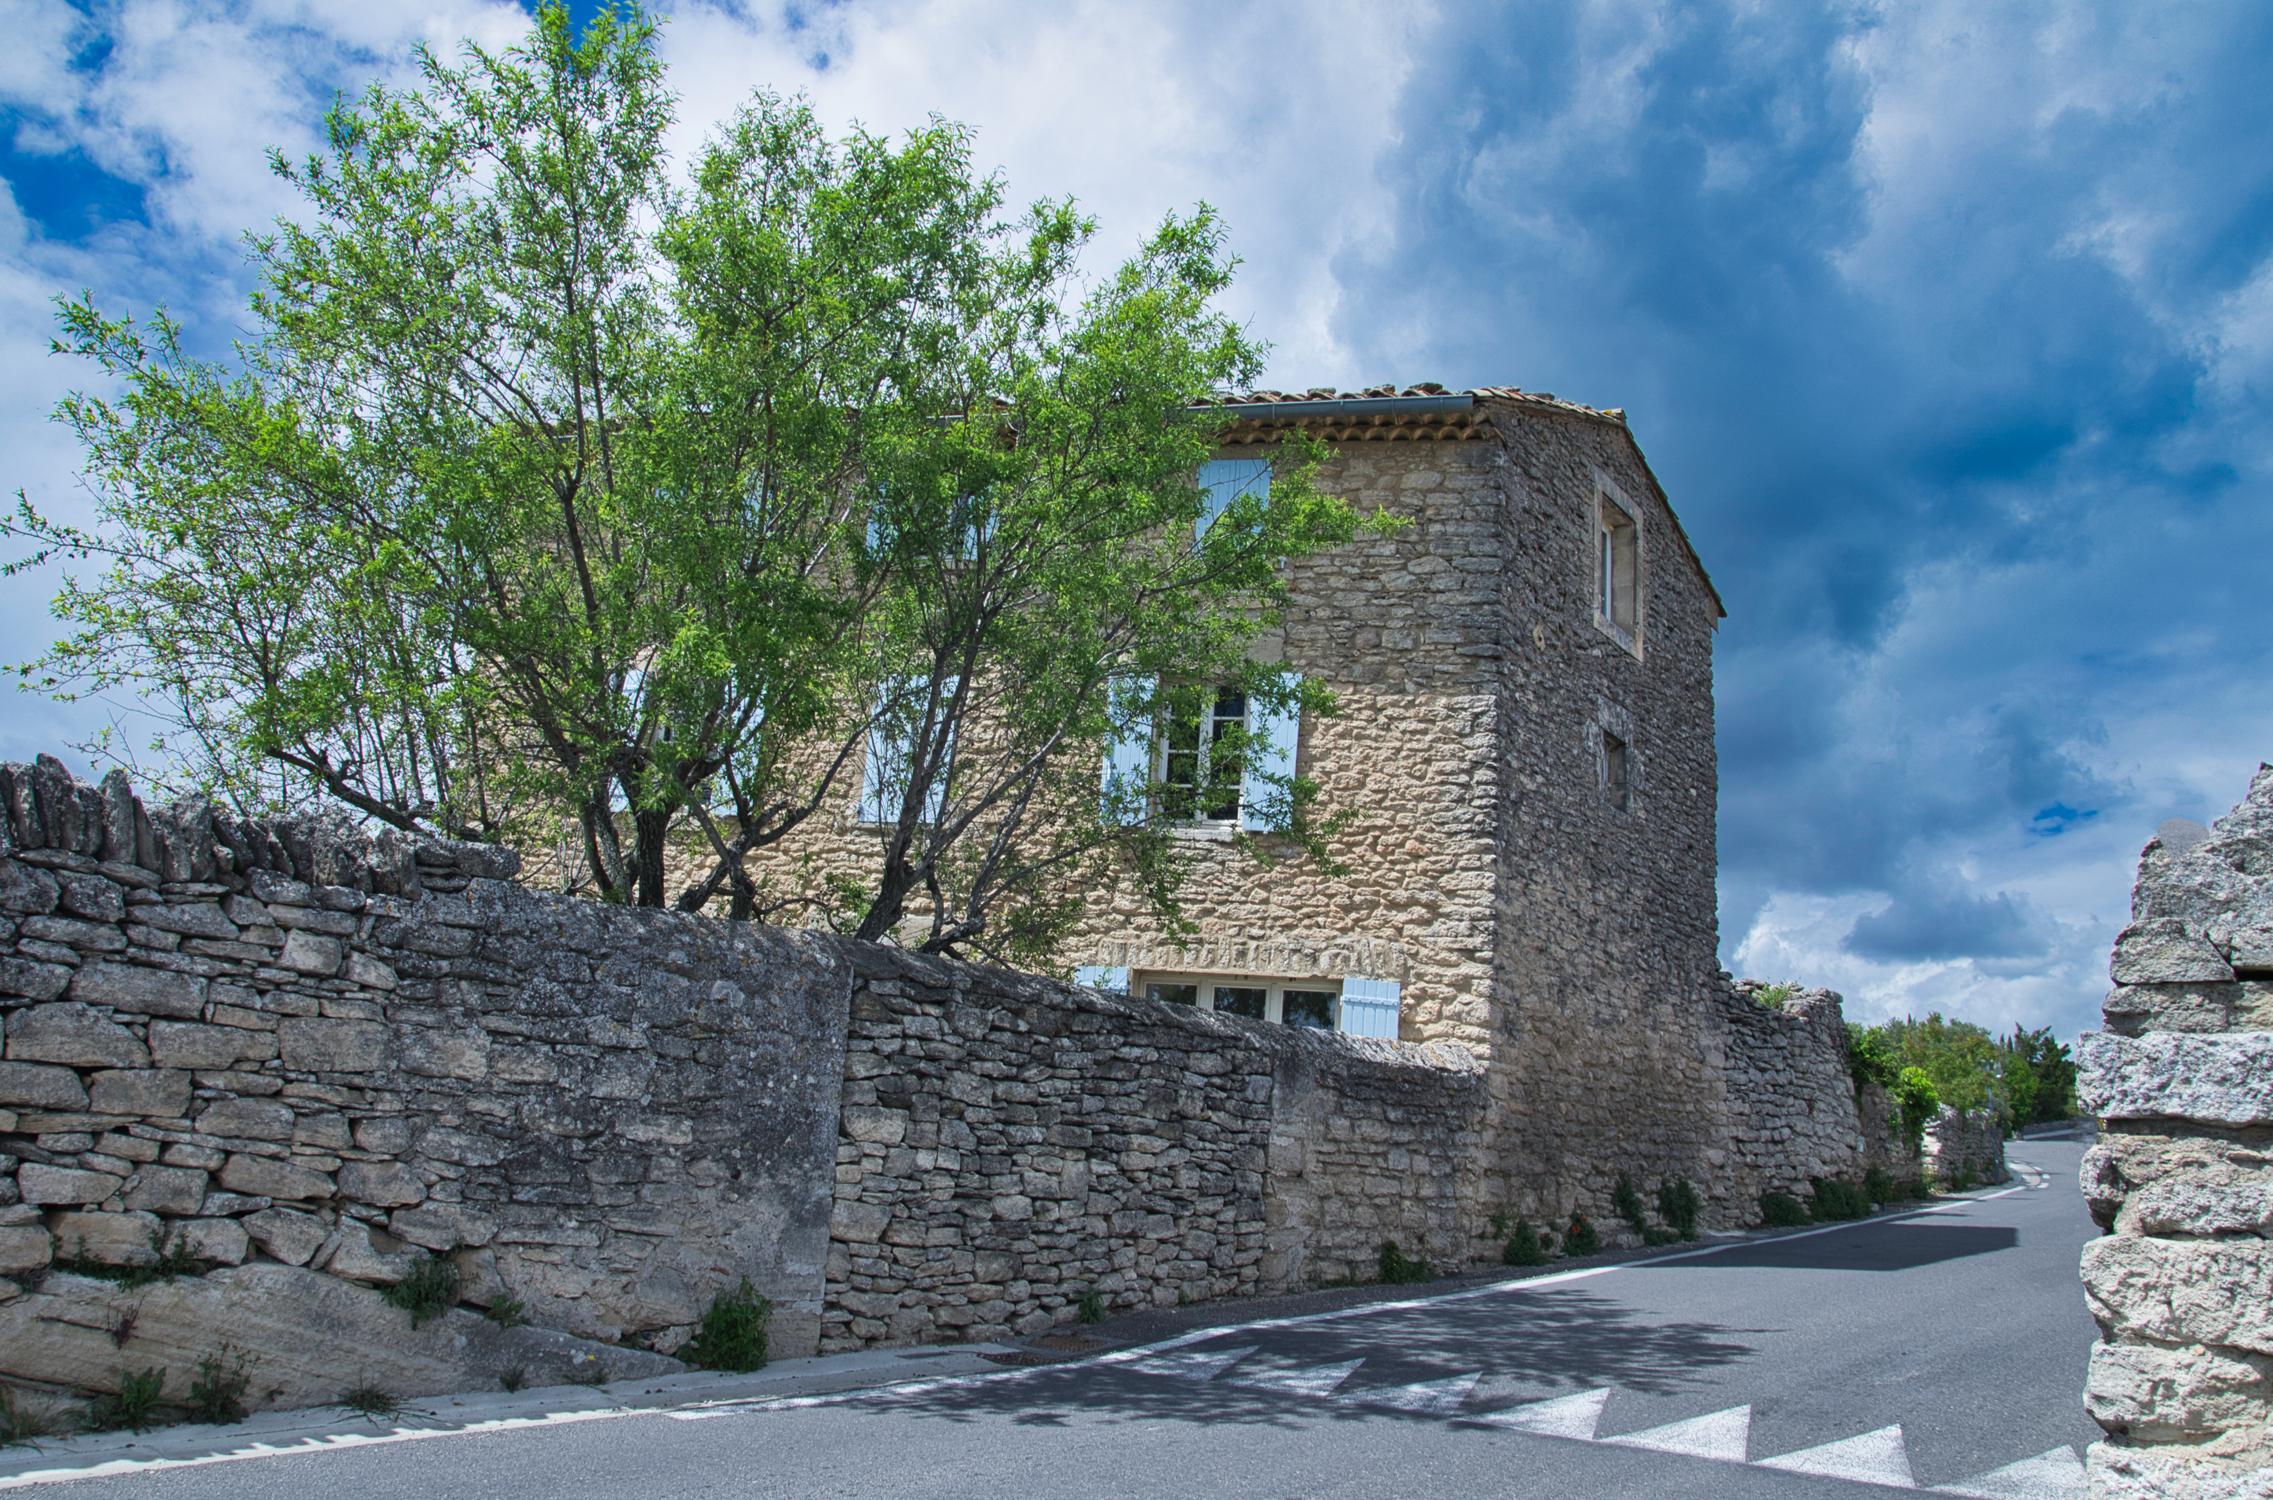 Gordes-Case del Luberon-Provenza_9726.jpeg